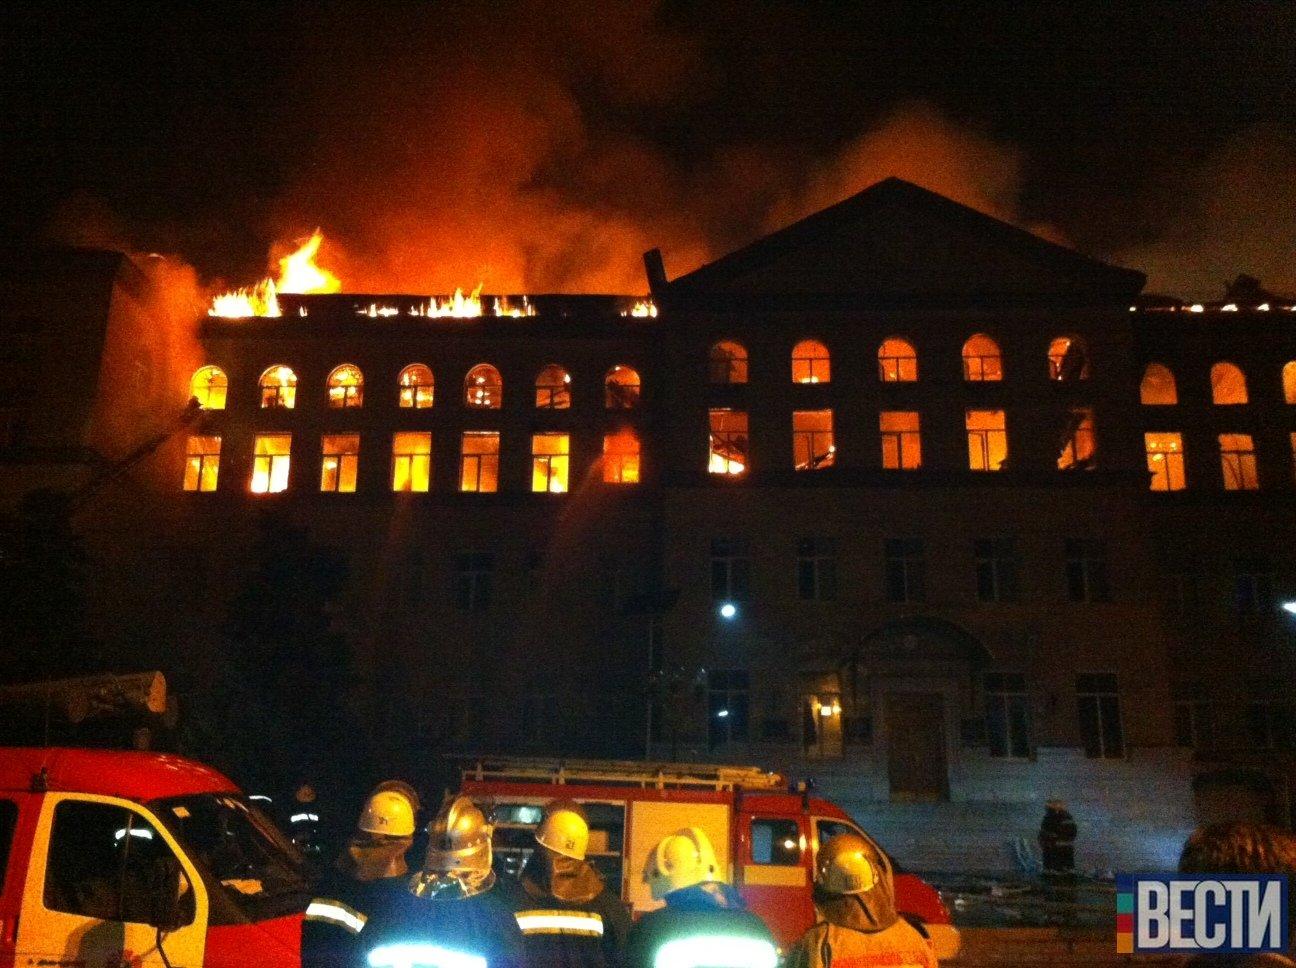 Пожар в здании Университета Крита потушен